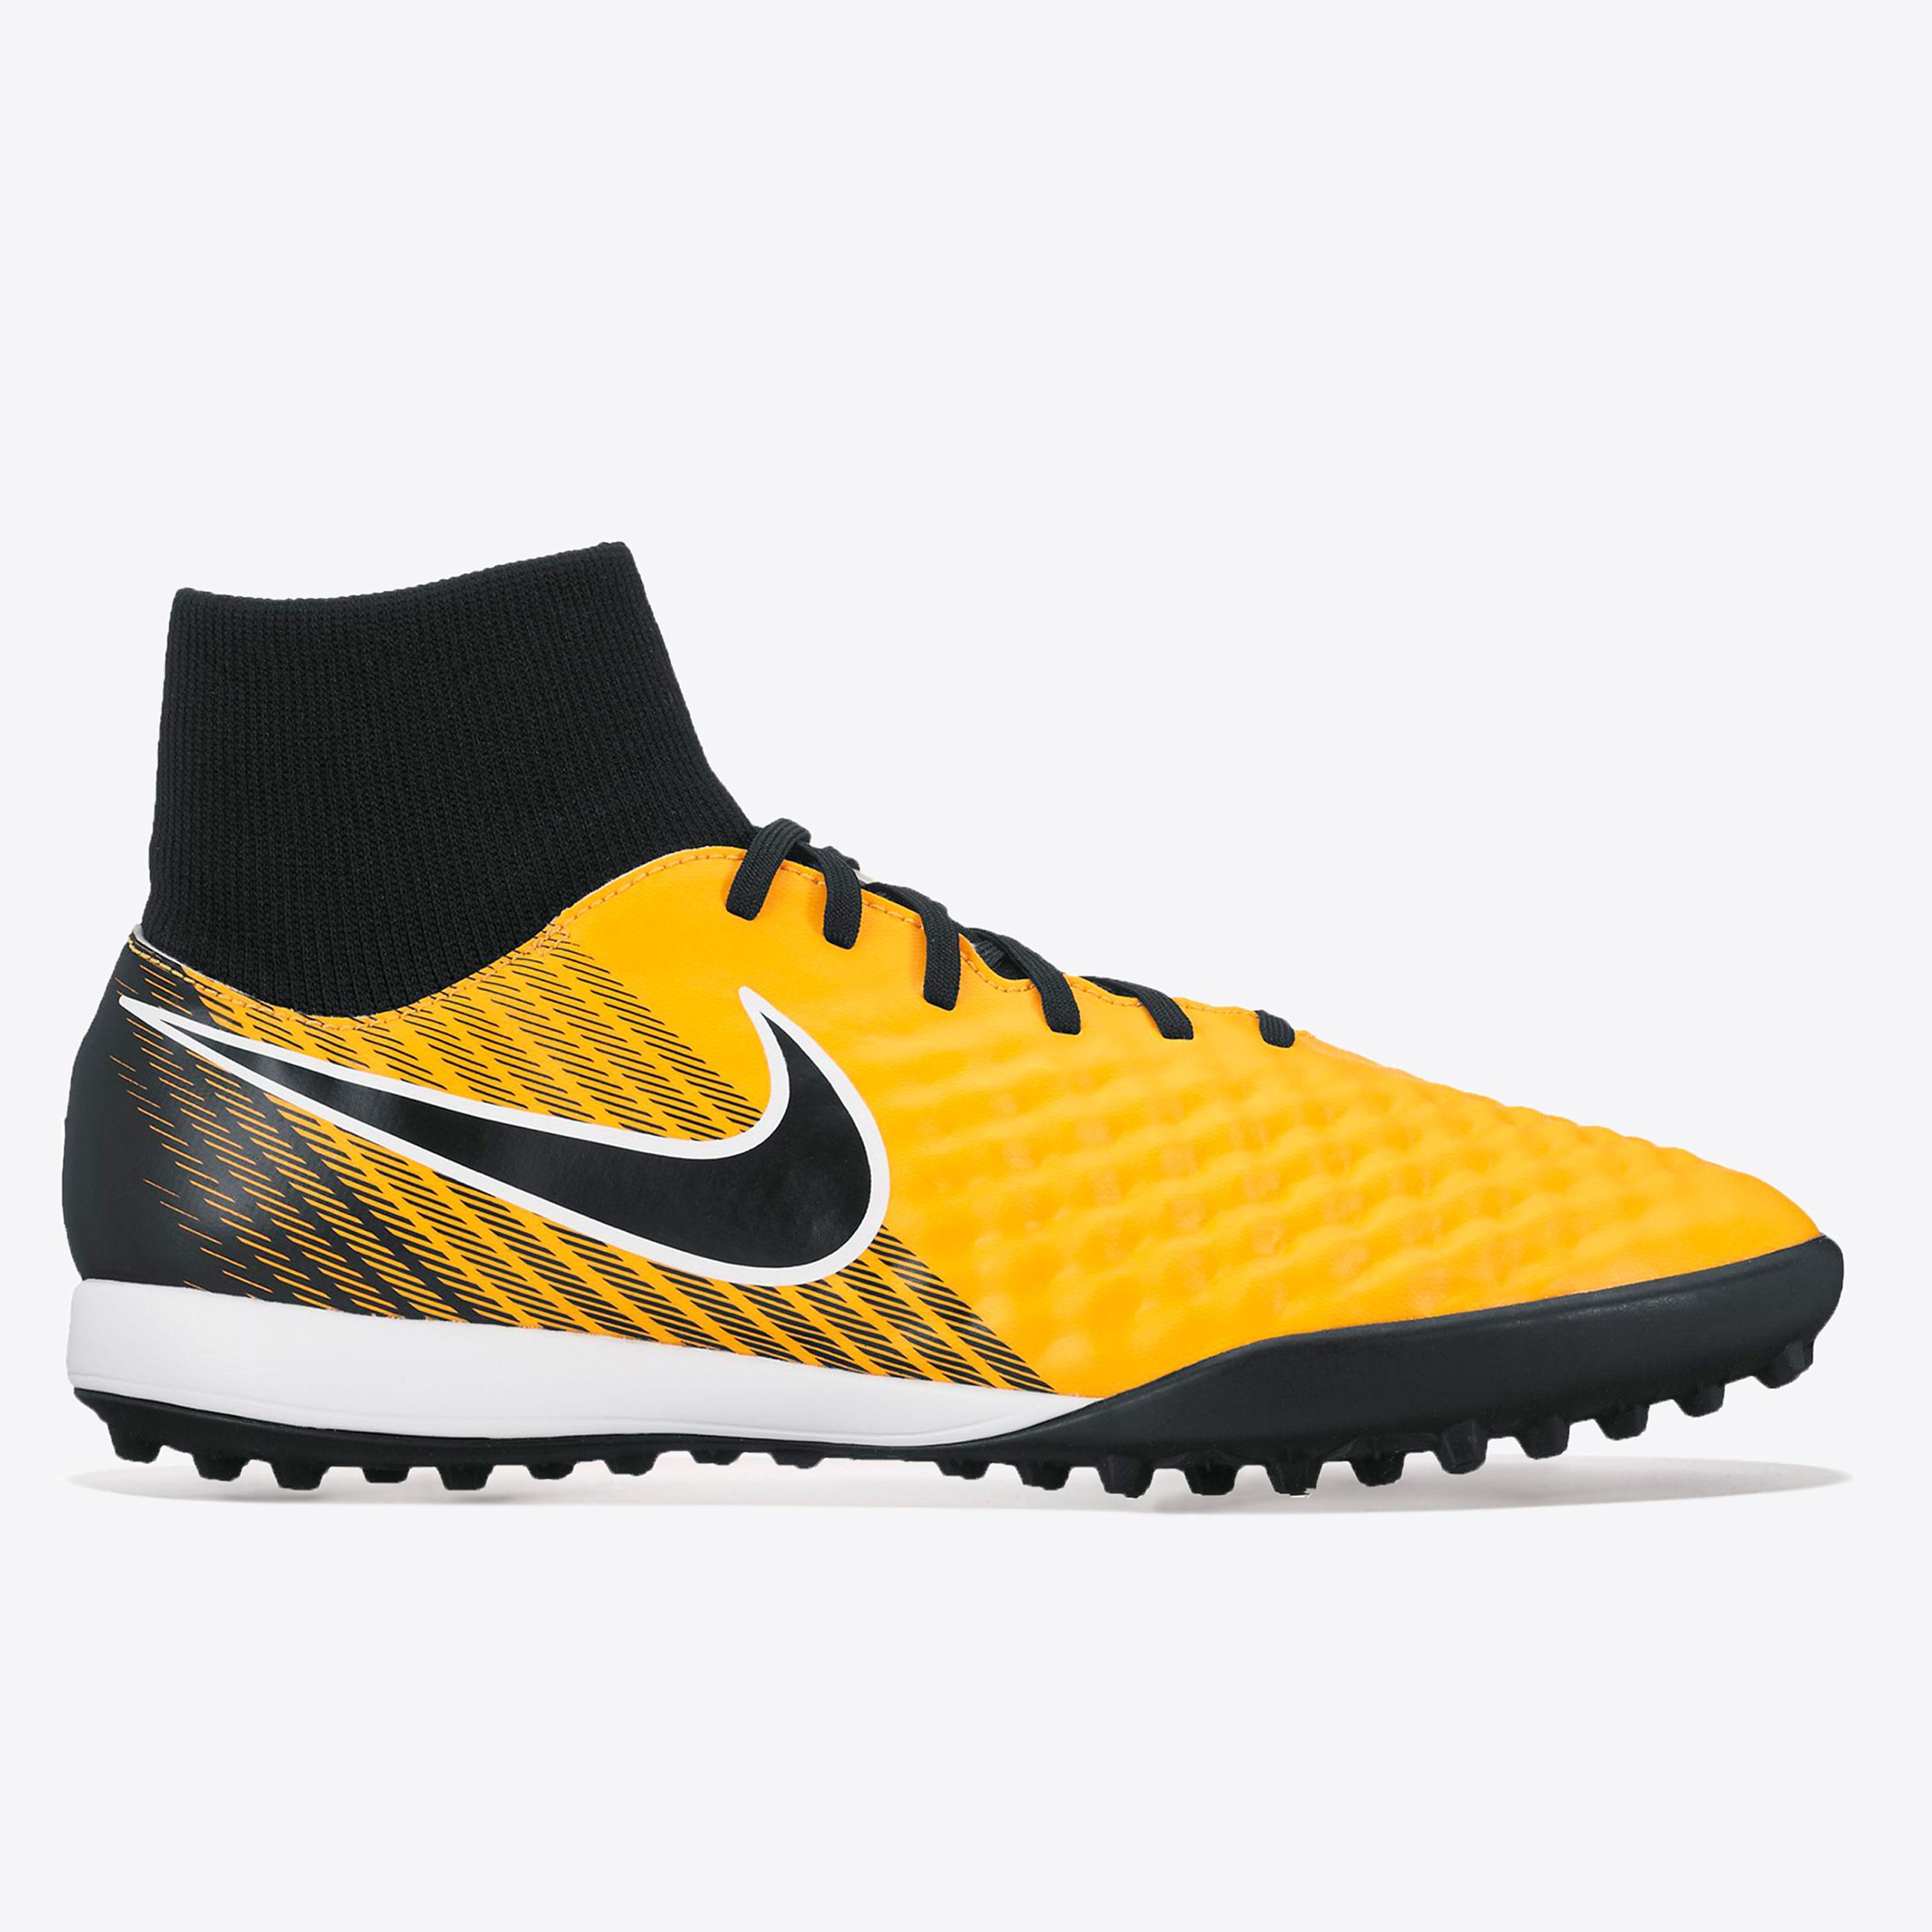 Nike Magista Onda II Dynamic Fit Astroturf Trainers - Laser Orange/Bla